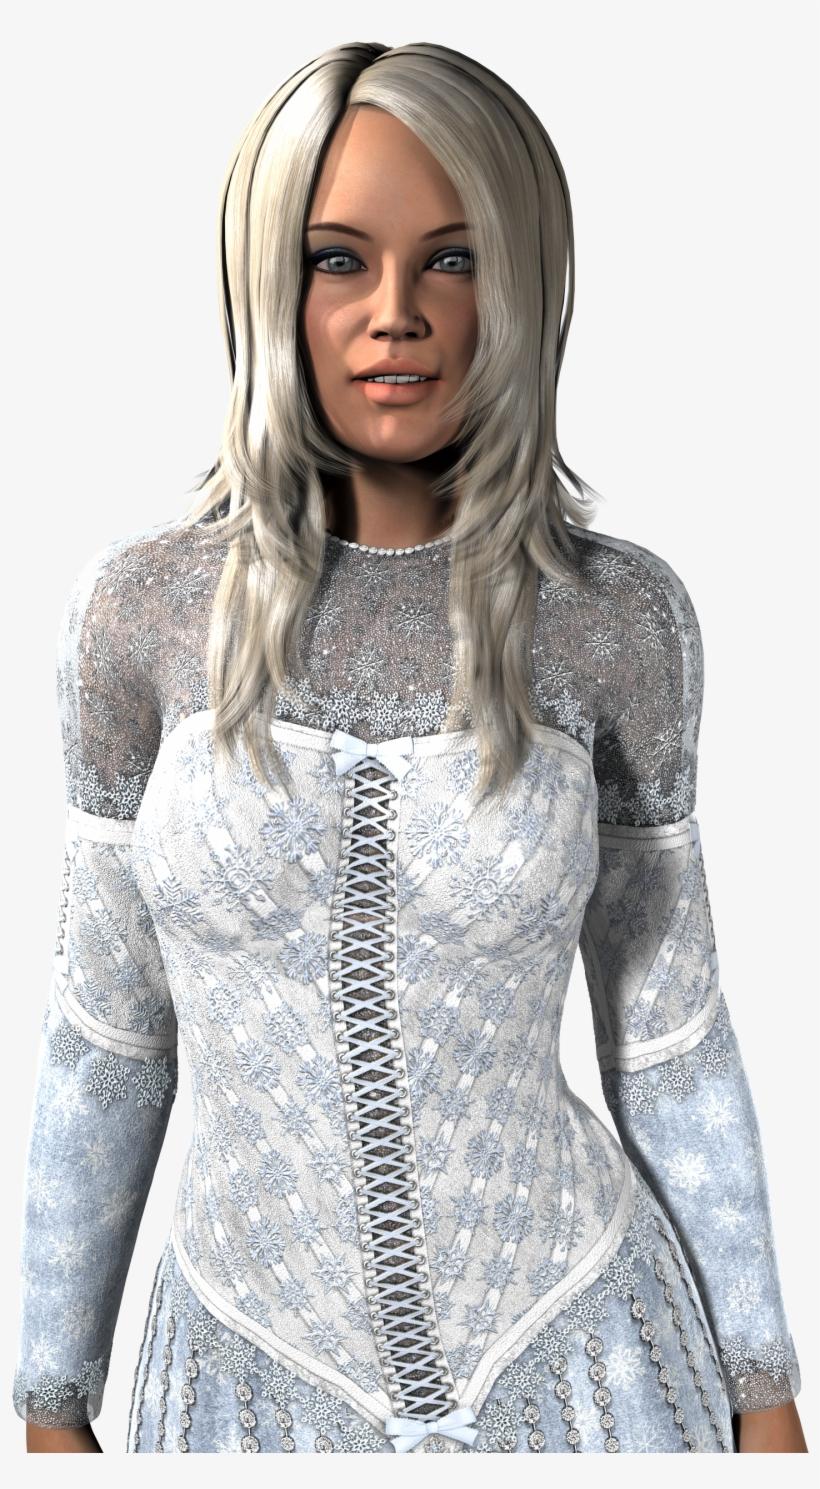 Woman Sexy Face Portrait Head 579561 - Girl, transparent png #1718593